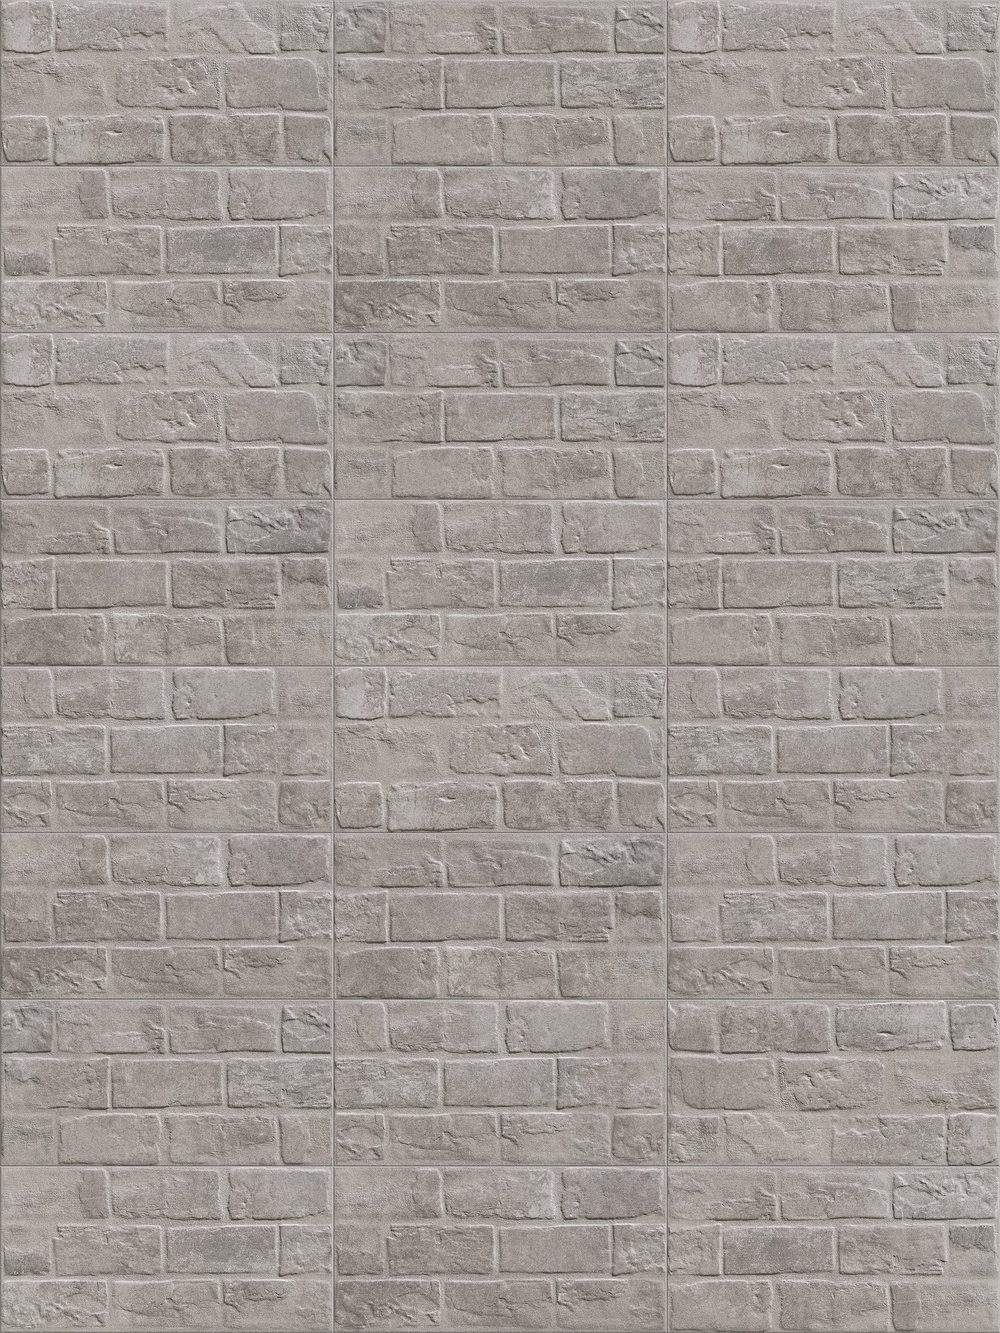 Pebble_Brick.jpg